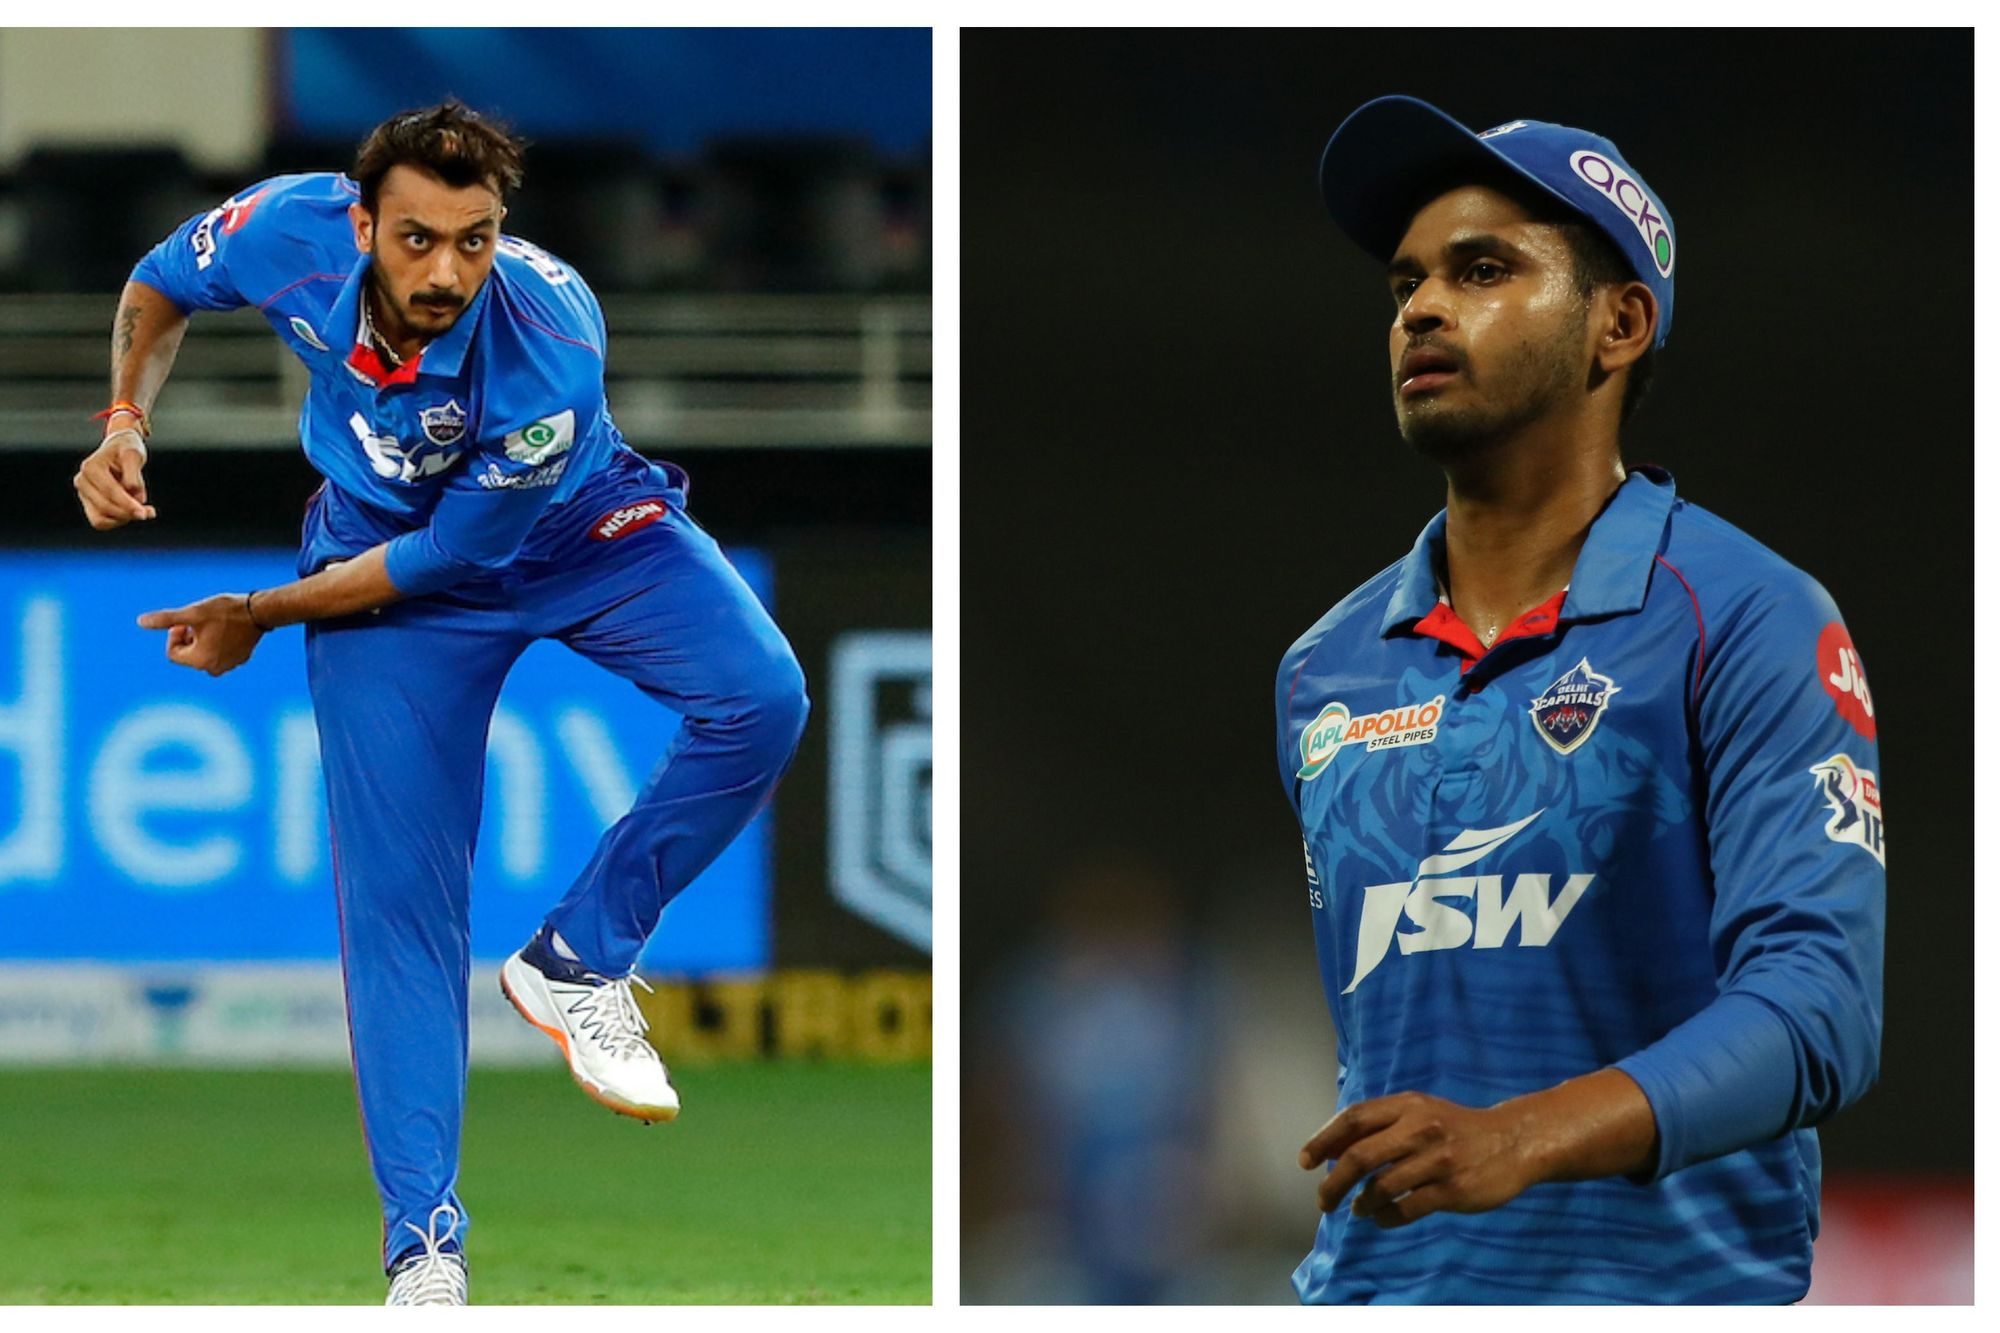 IPL: Shams Mulani joins Delhi Capitals as short-term COVID-19 replacement for Axar Patel; Anirudha Joshi replaces injured Shreyas Iyer